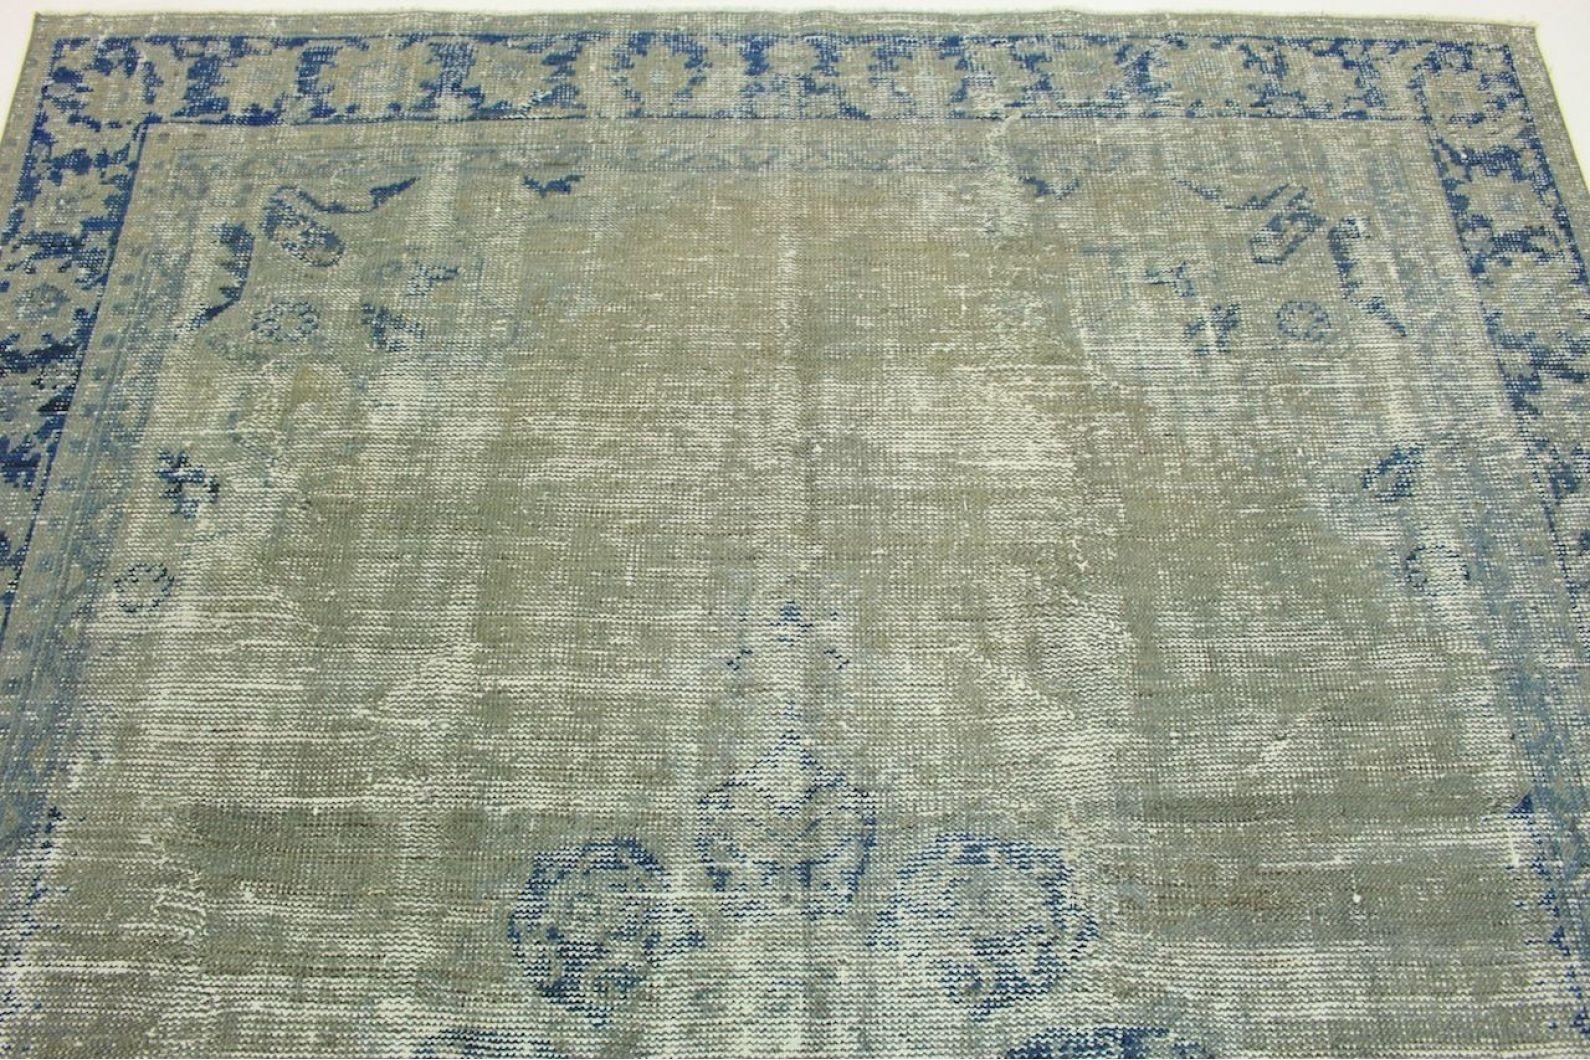 vintage teppich grau in 300x200cm 1011 5100 bei. Black Bedroom Furniture Sets. Home Design Ideas